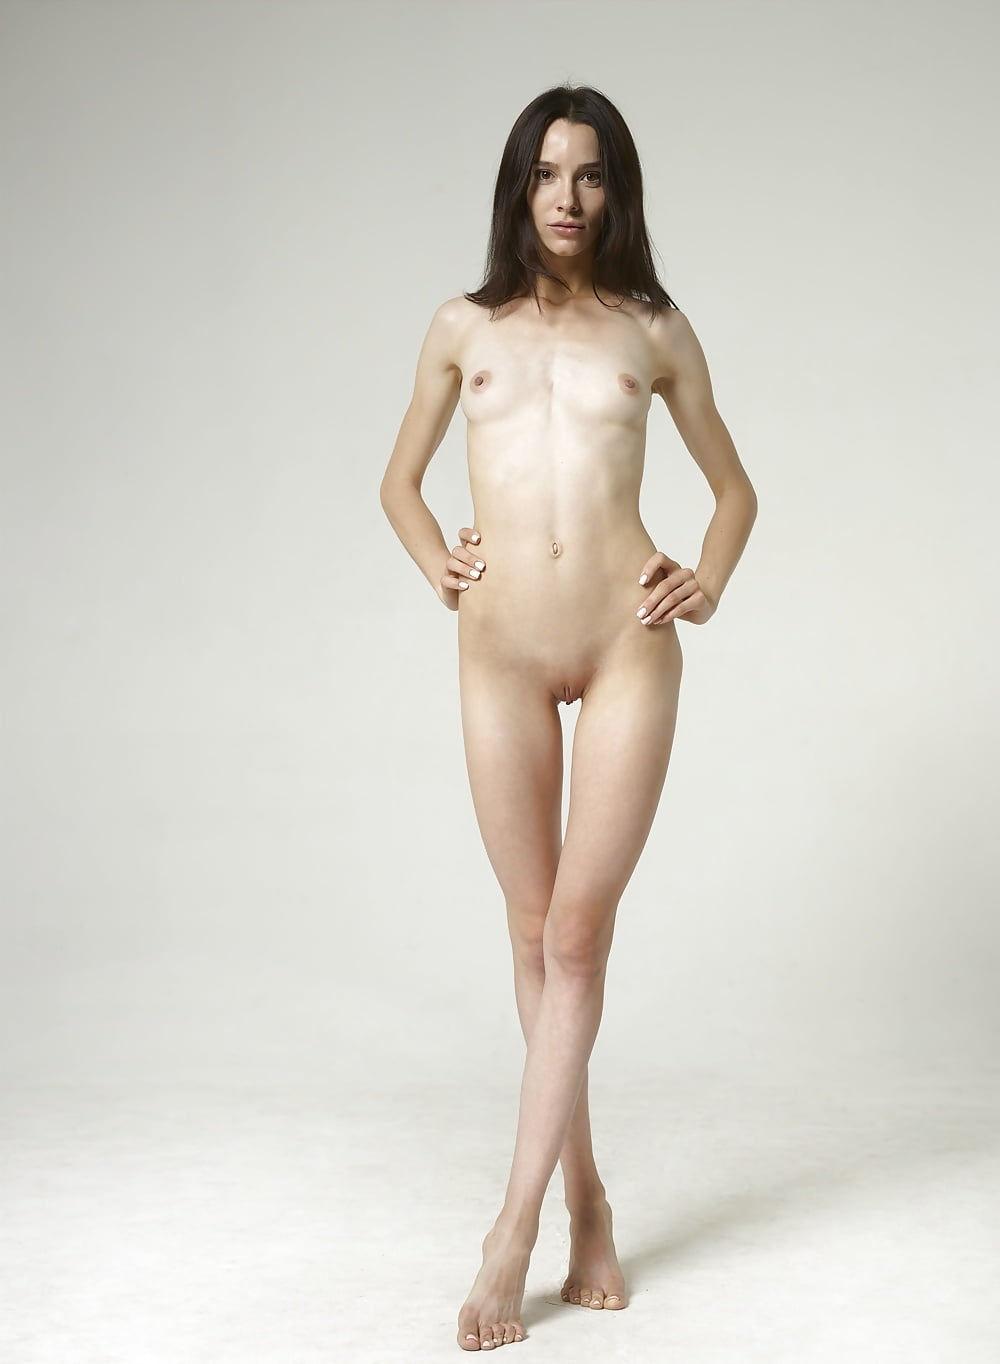 Skinny Bitches Porn